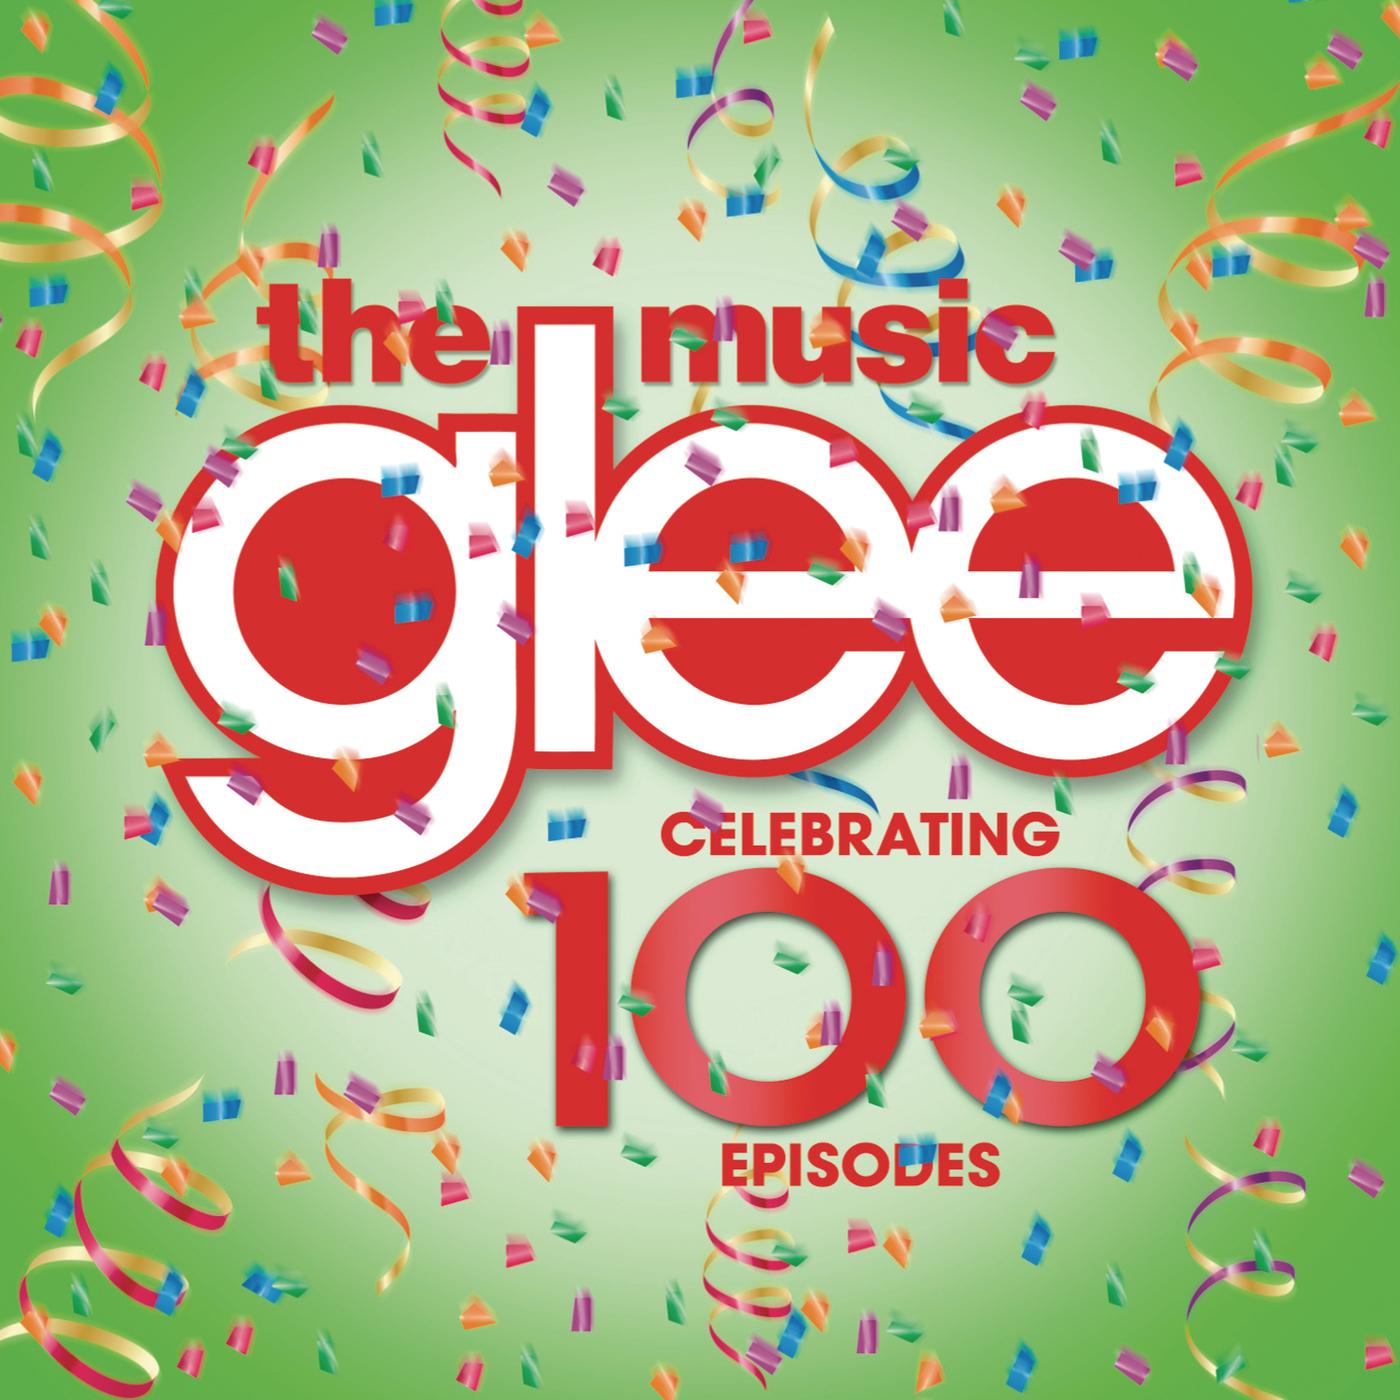 Glee: The Music - Celebrating 100 Episodes - Glee Cast